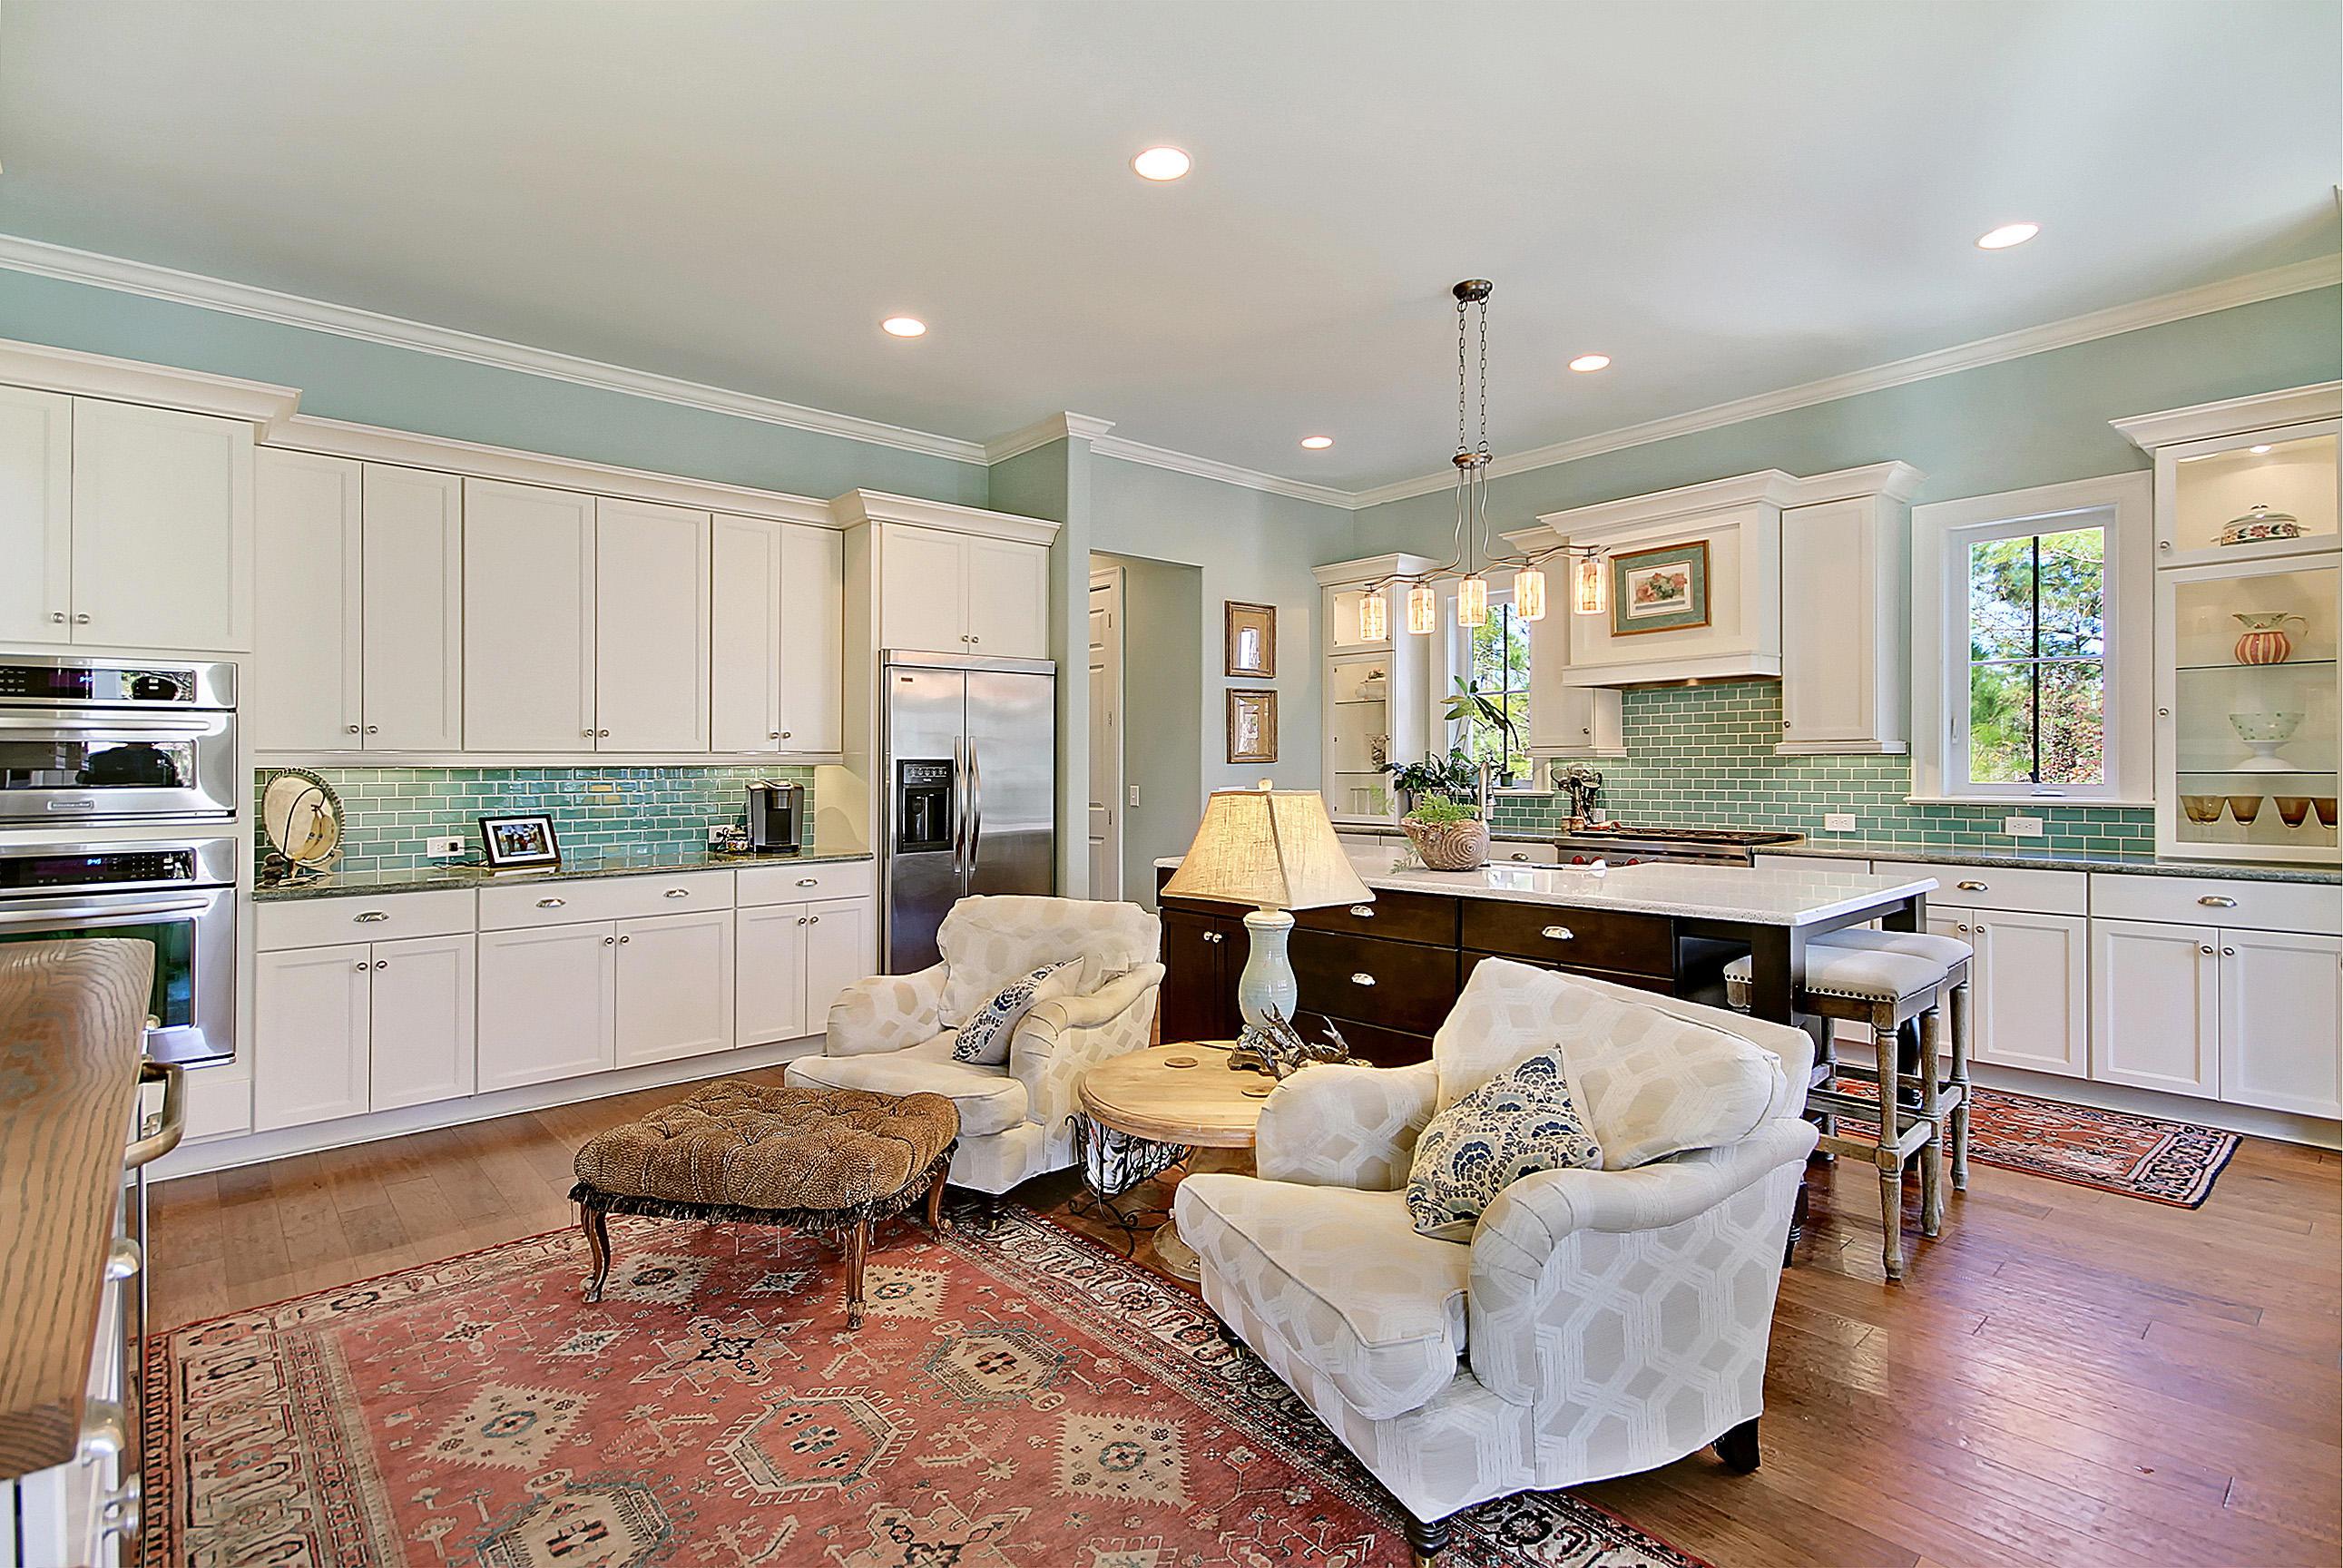 Rivertowne Country Club Homes For Sale - 2601 Kiln Creek, Mount Pleasant, SC - 70